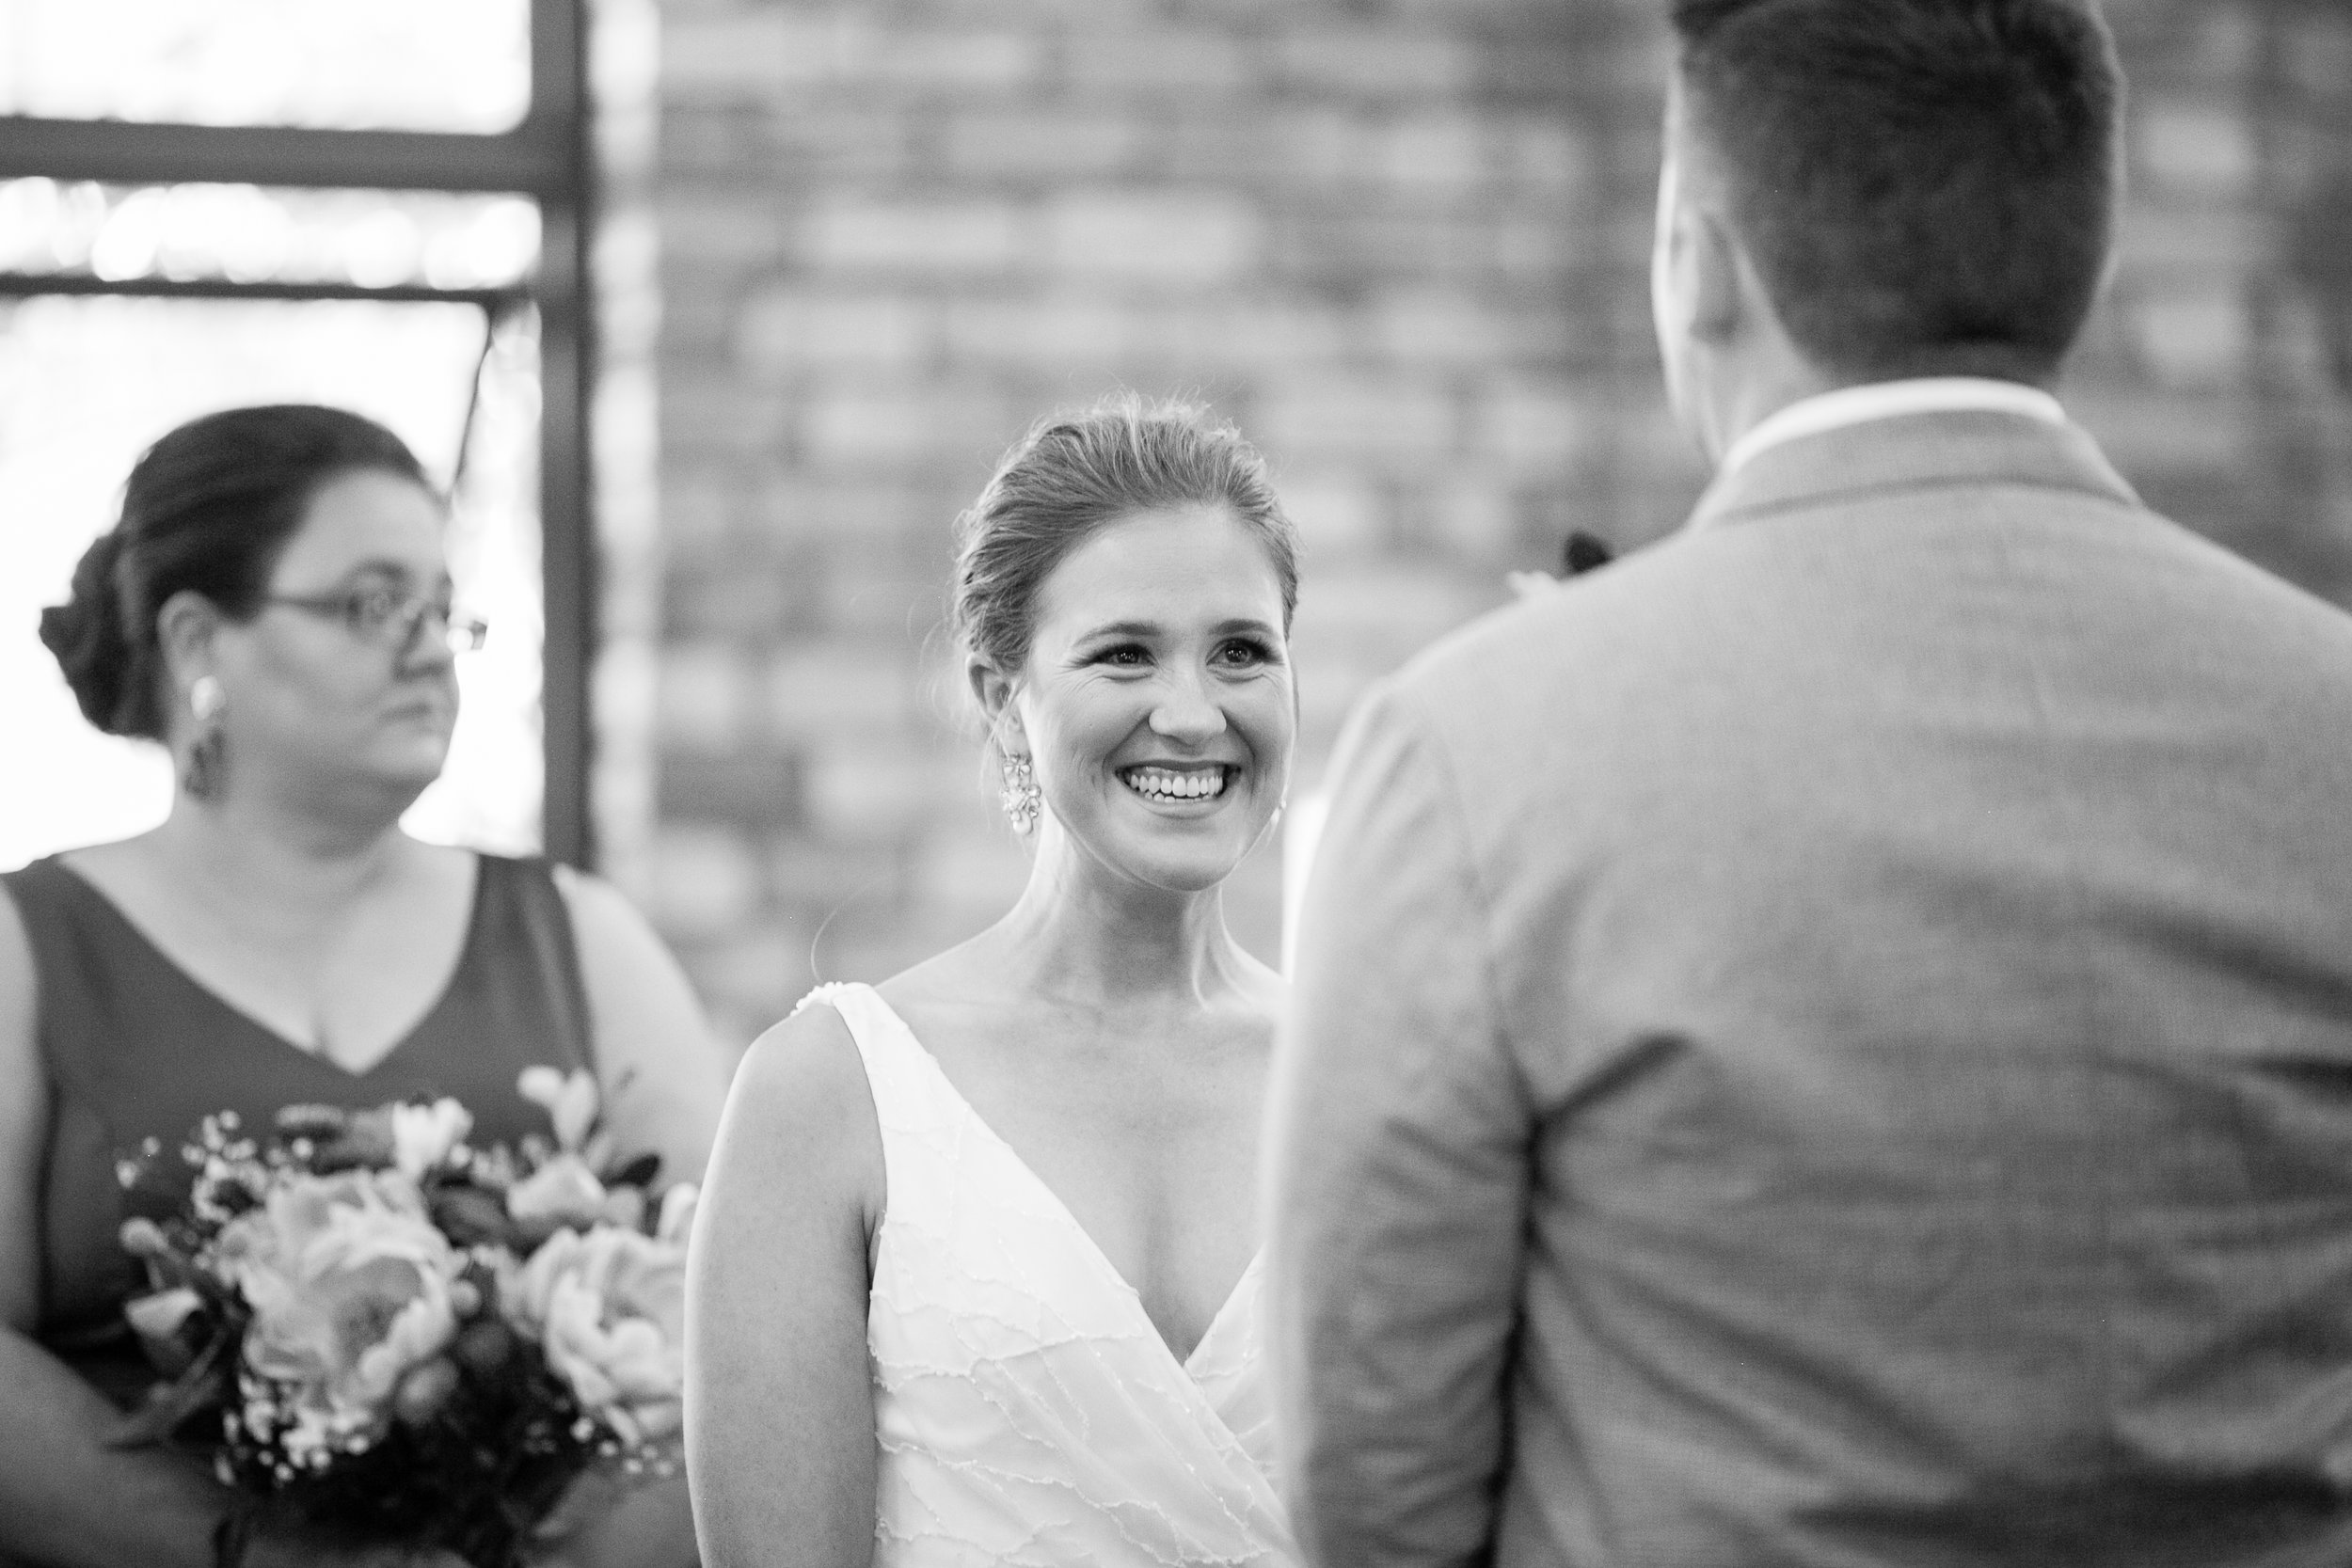 refinery-wedding-brisbane-city-wedding-photographer-46.jpg